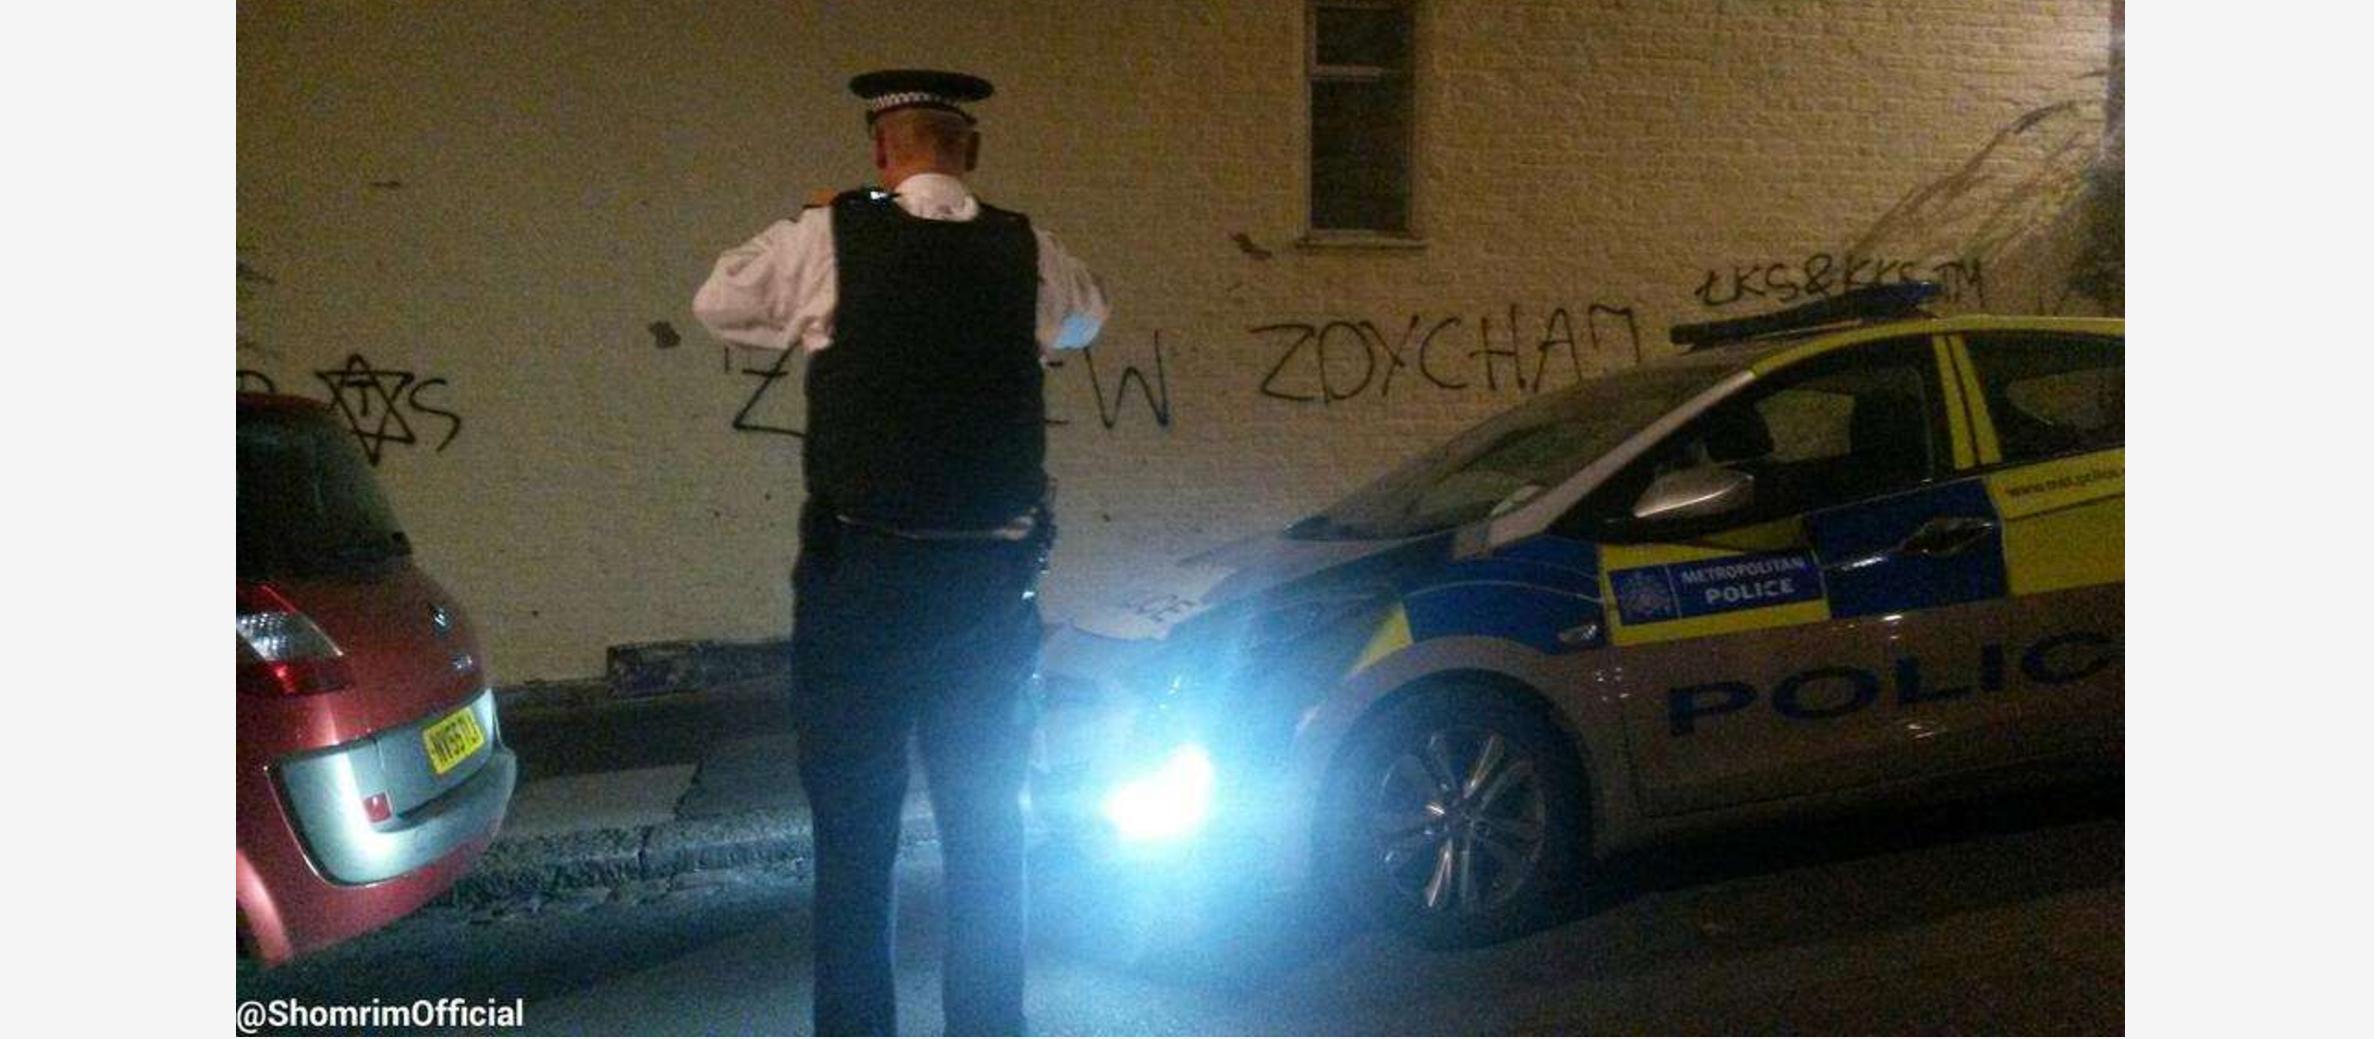 Police investigating alleged anti-Semitic graffiti in Tottenham